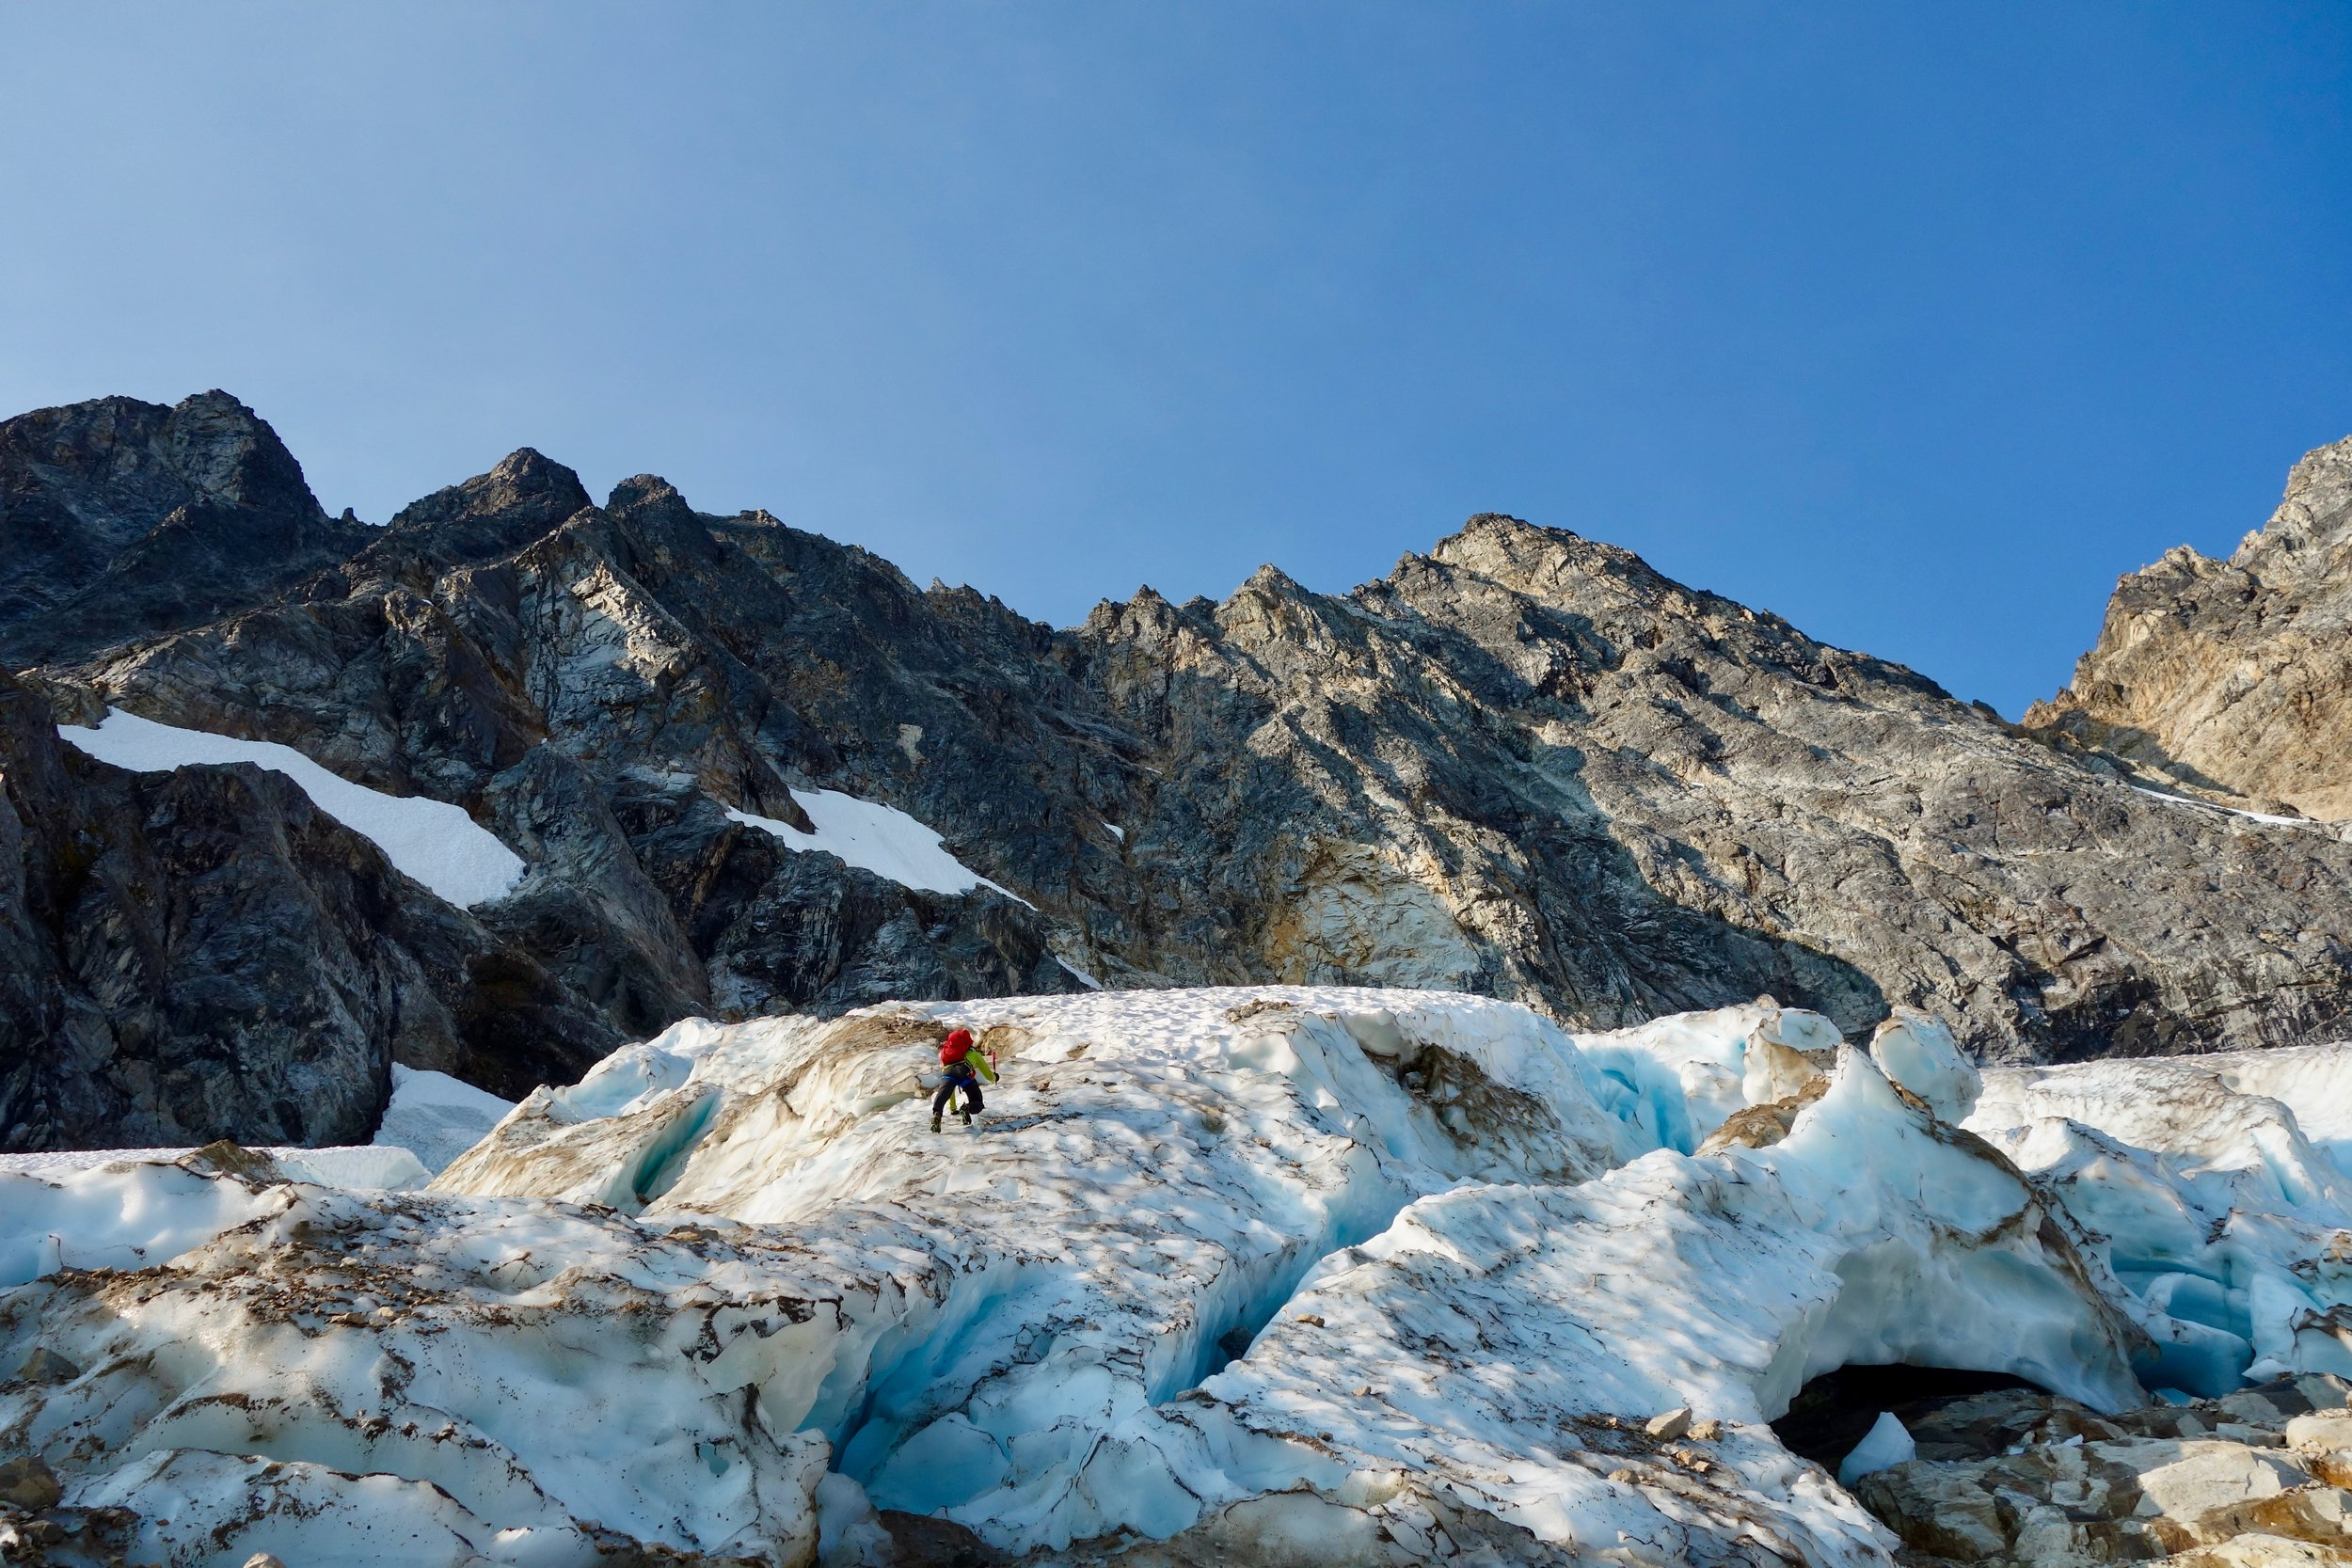 Getting onto the glacier